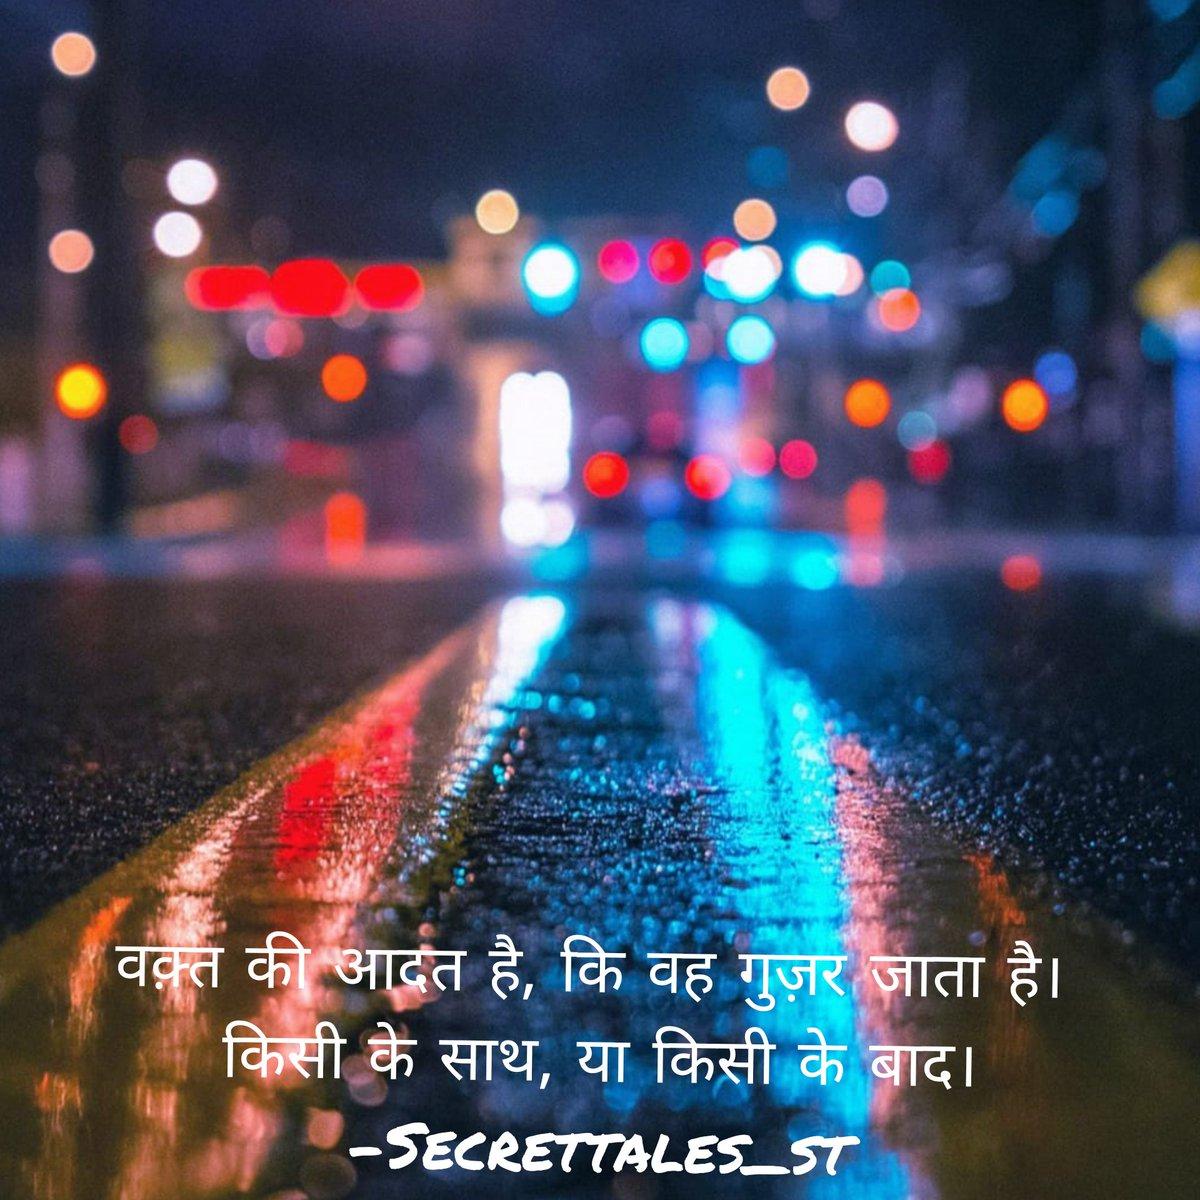 Waqt ki aadat #AlyGoni #secrettales_st #SaturdayMorning #MotivationalQuotes #morningvibes